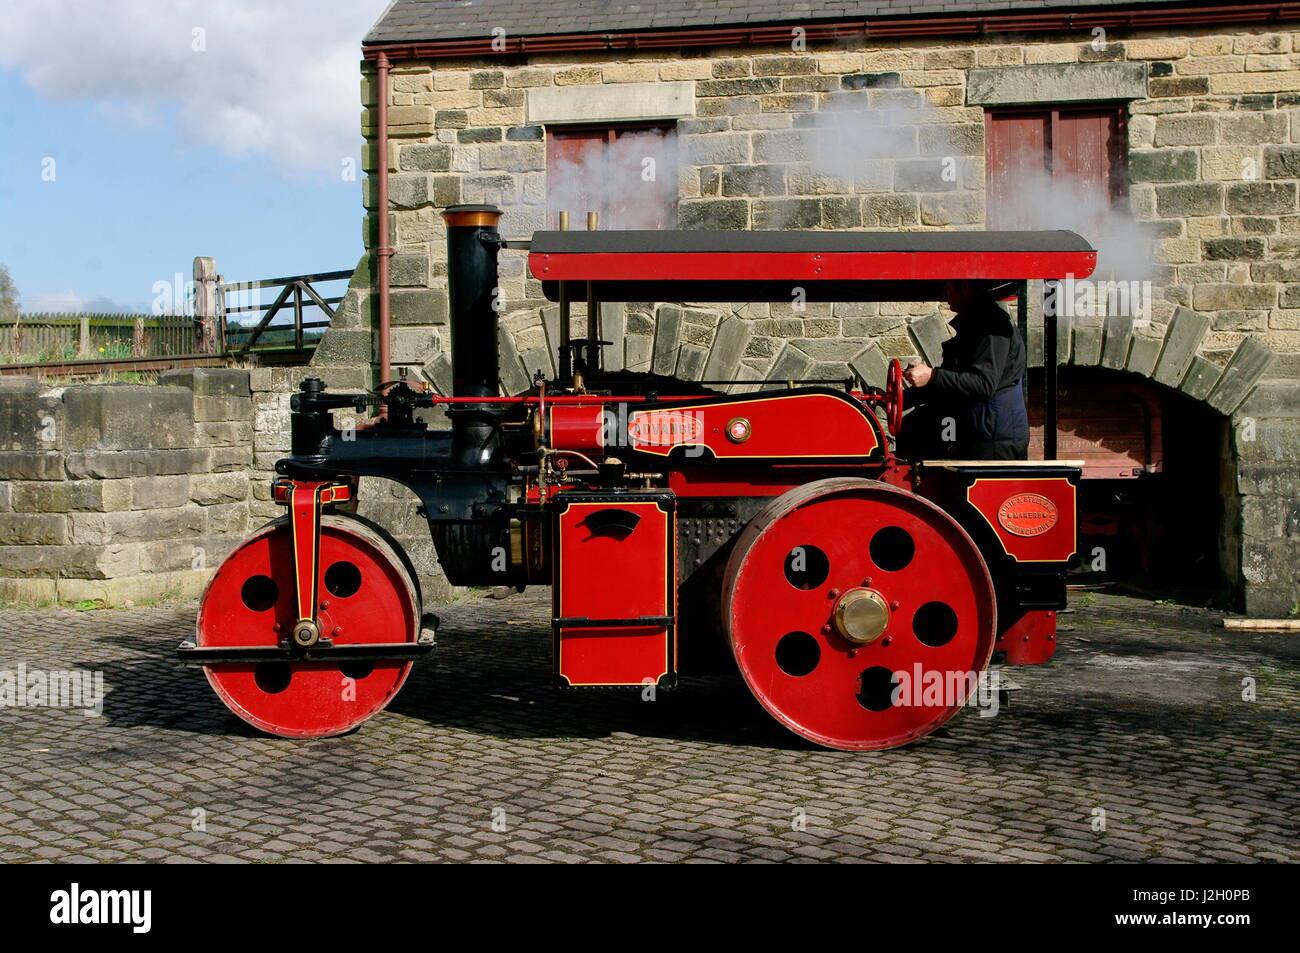 Wallis Advance Steam Roller - Stock Image